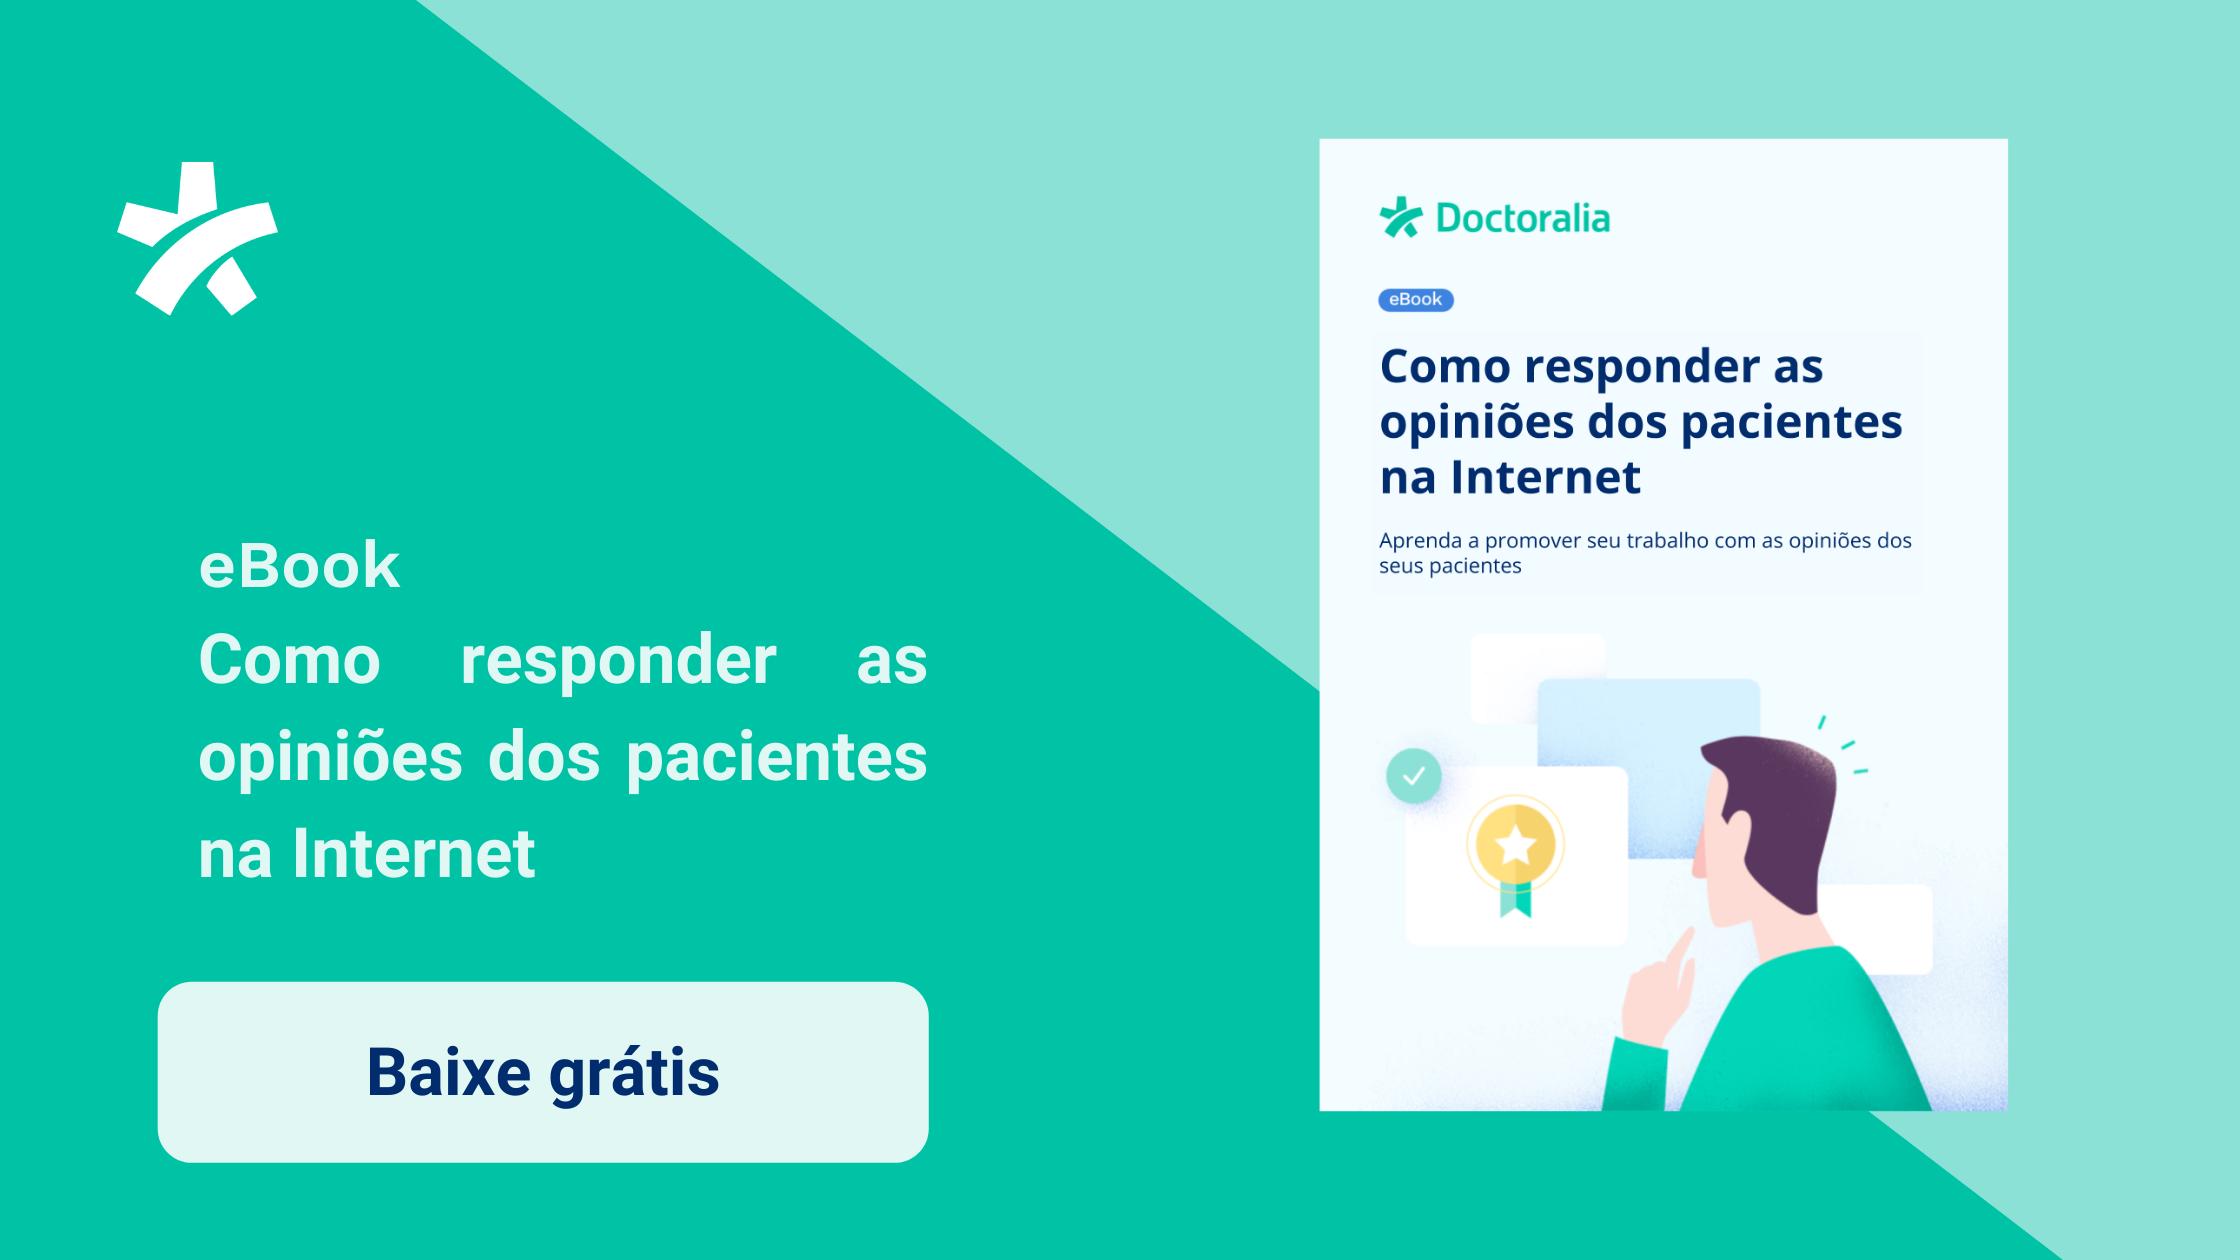 BR LG E DOC BANNER BLOG EBOOK OPINIOES DE PACIENTES